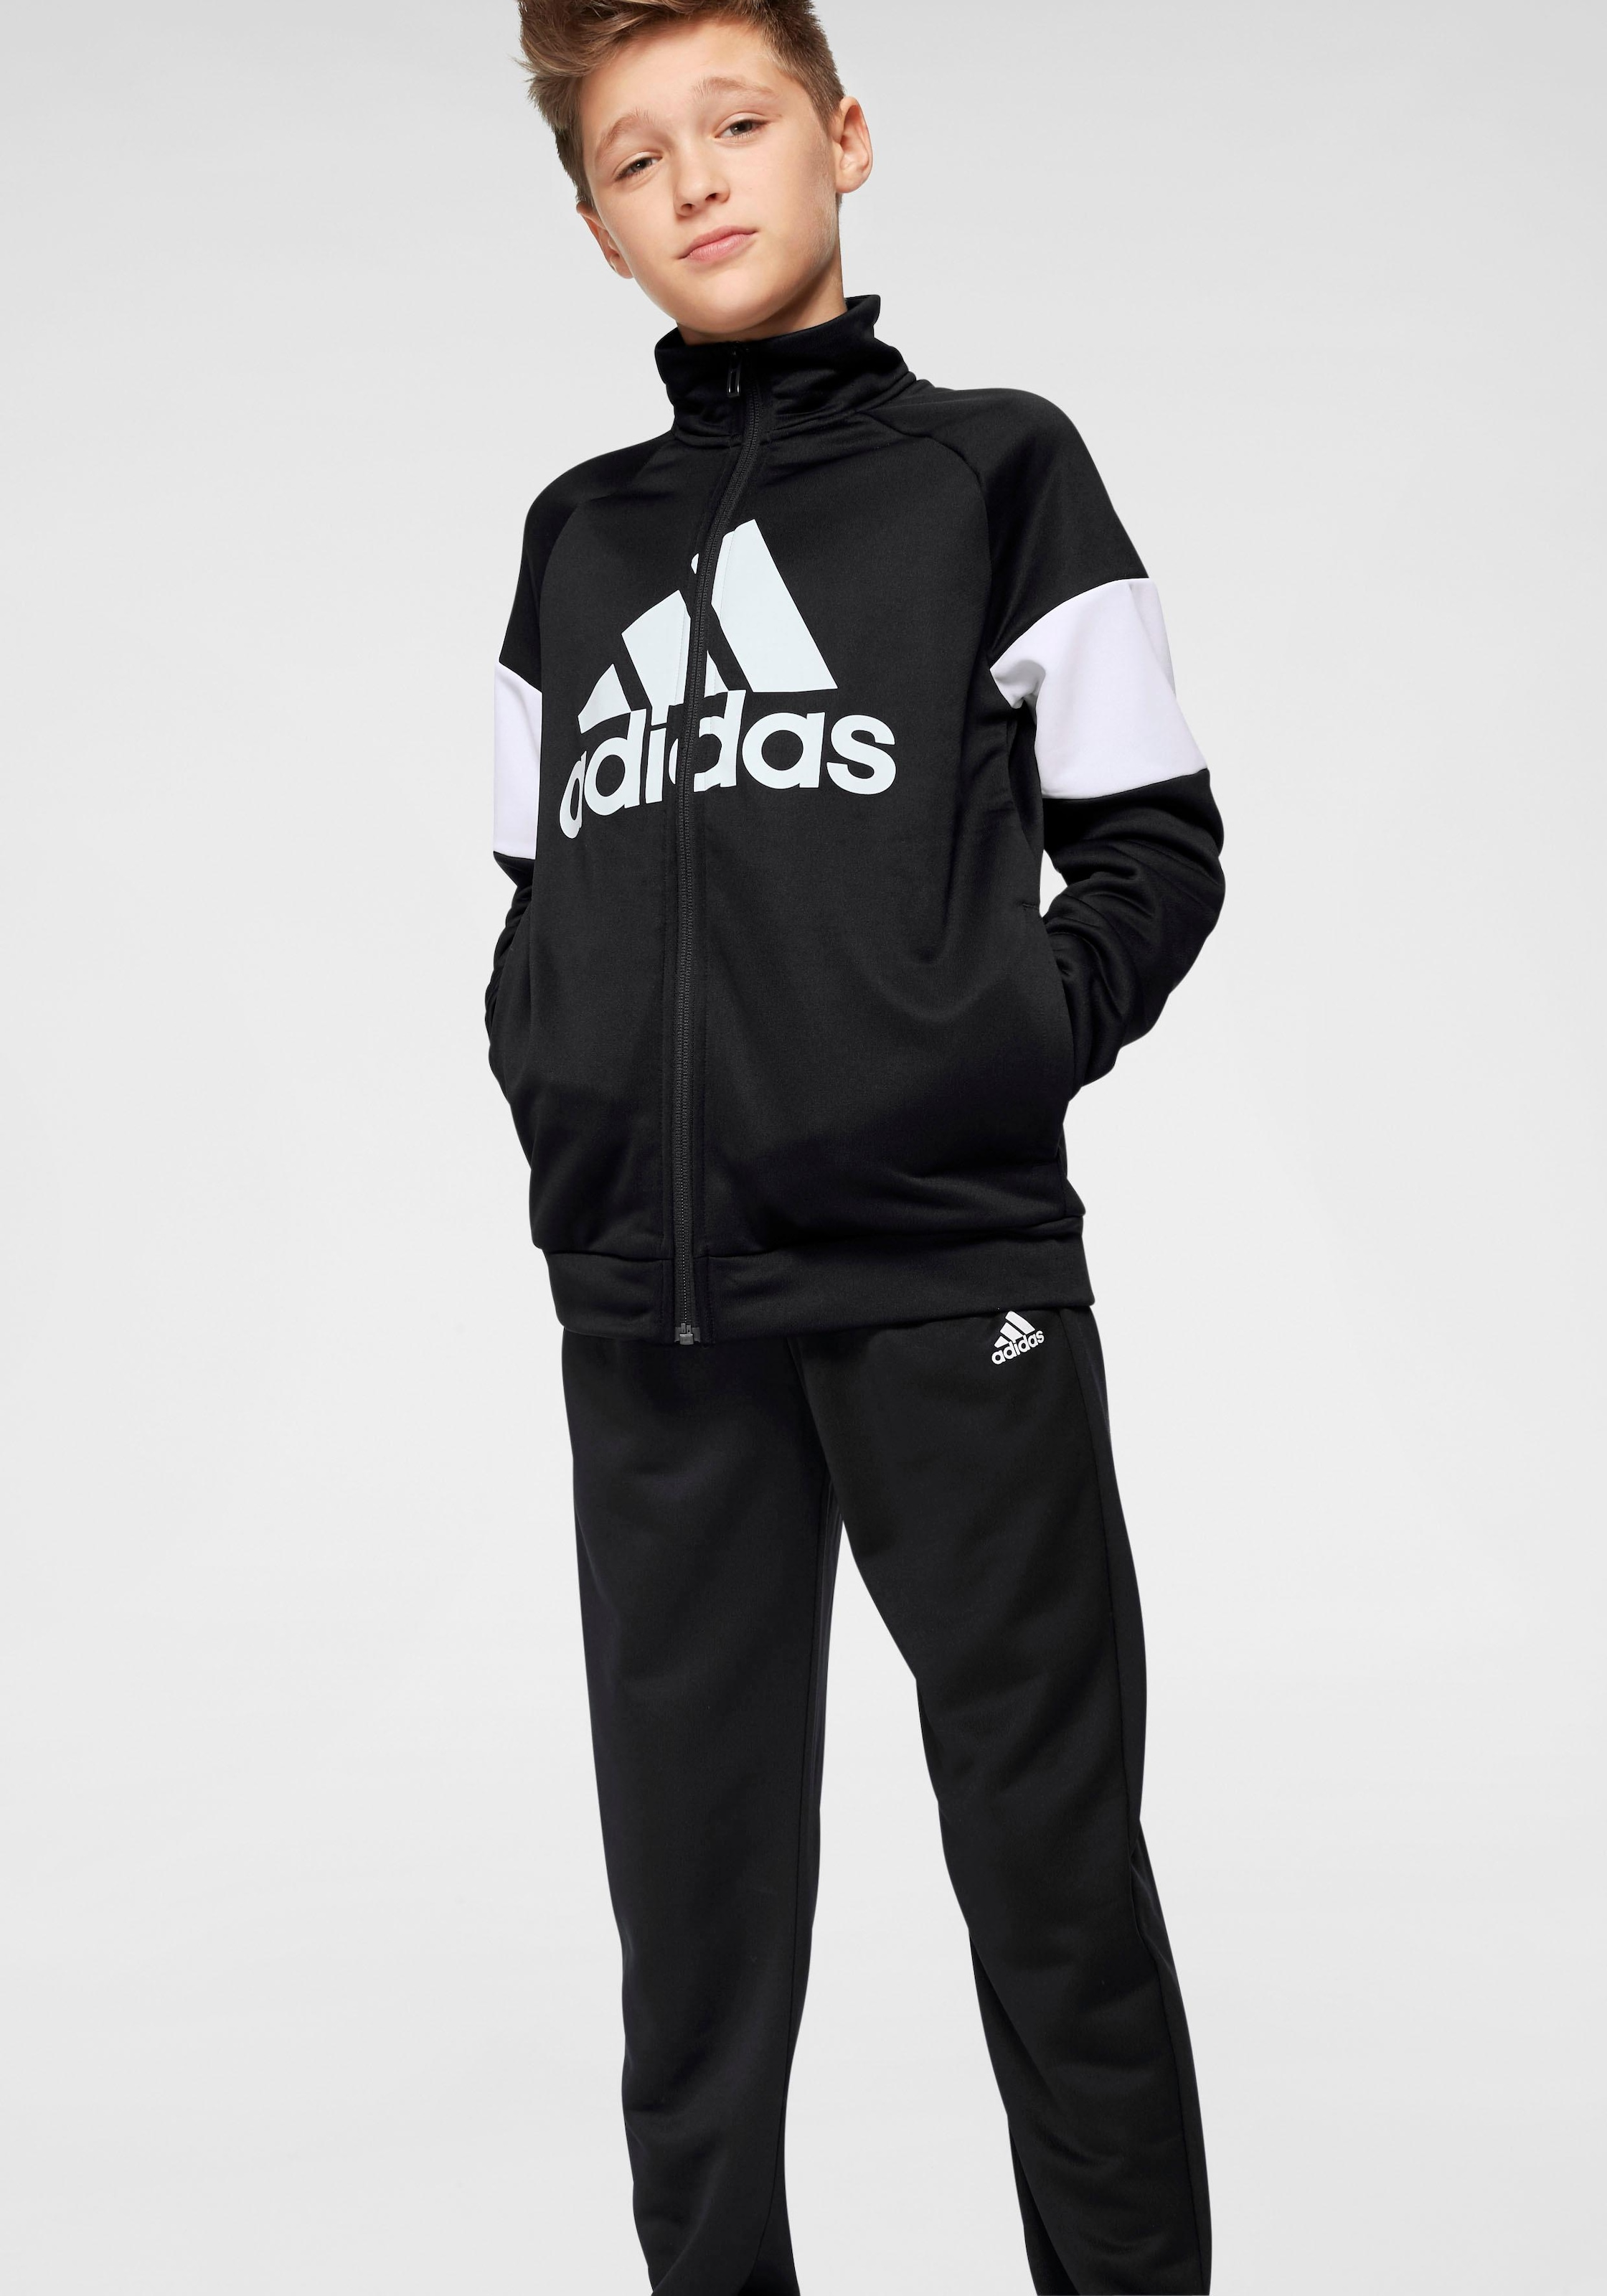 adidas Performance Trainingsanzug »YOUNG BOYS TRACKSUIT BATCH OF SPORT« (Set, 2 tlg.)   BAUR